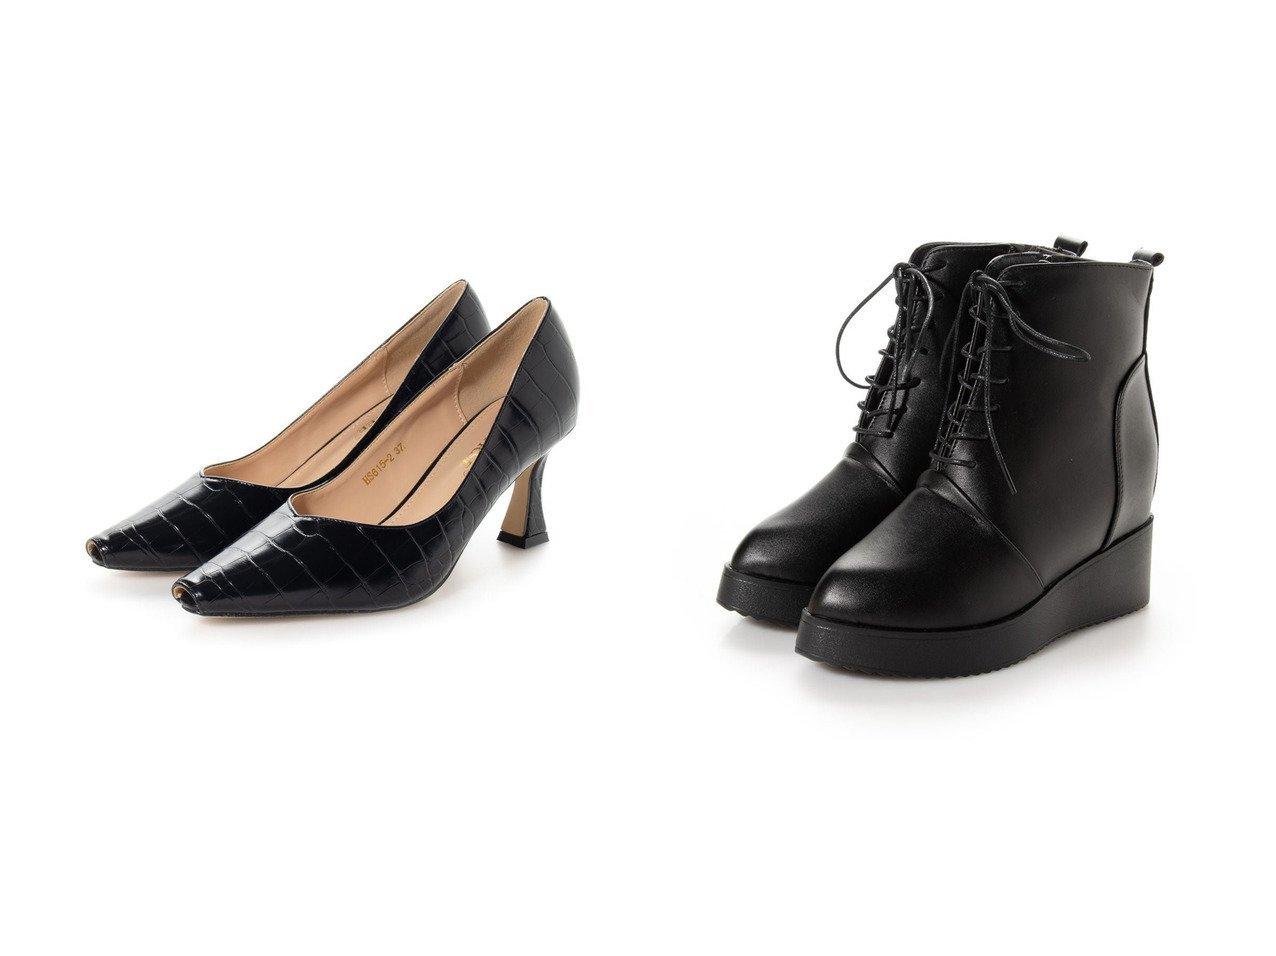 【SVEC/シュベック】のポインテッドトゥパンプス&ショートブーツ シューズ・靴のおすすめ!人気、トレンド・レディースファッションの通販  おすすめで人気の流行・トレンド、ファッションの通販商品 メンズファッション・キッズファッション・インテリア・家具・レディースファッション・服の通販 founy(ファニー) https://founy.com/ ファッション Fashion レディースファッション WOMEN シューズ ショート デニム トレンド ベーシック ミリタリー クロコ シンプル ラグジュアリー 定番 Standard |ID:crp329100000019300